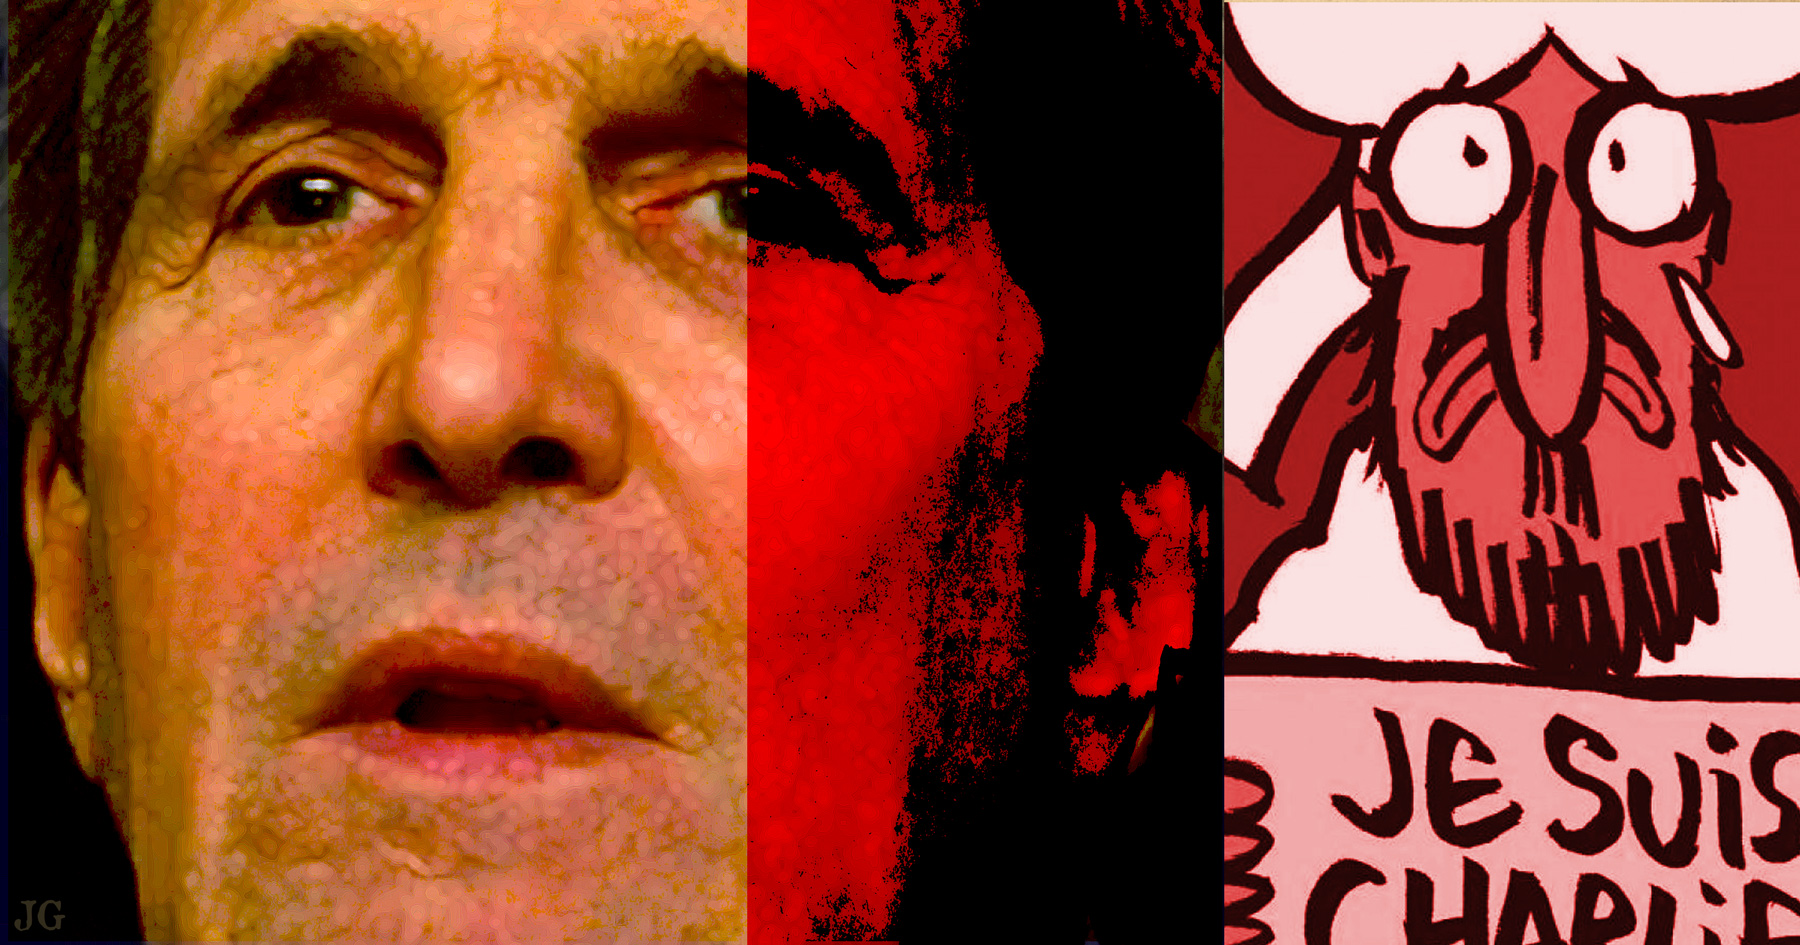 John Kerry, Charlie Hebdo, Paris Attack, terrorism, Common Sense, Illustration